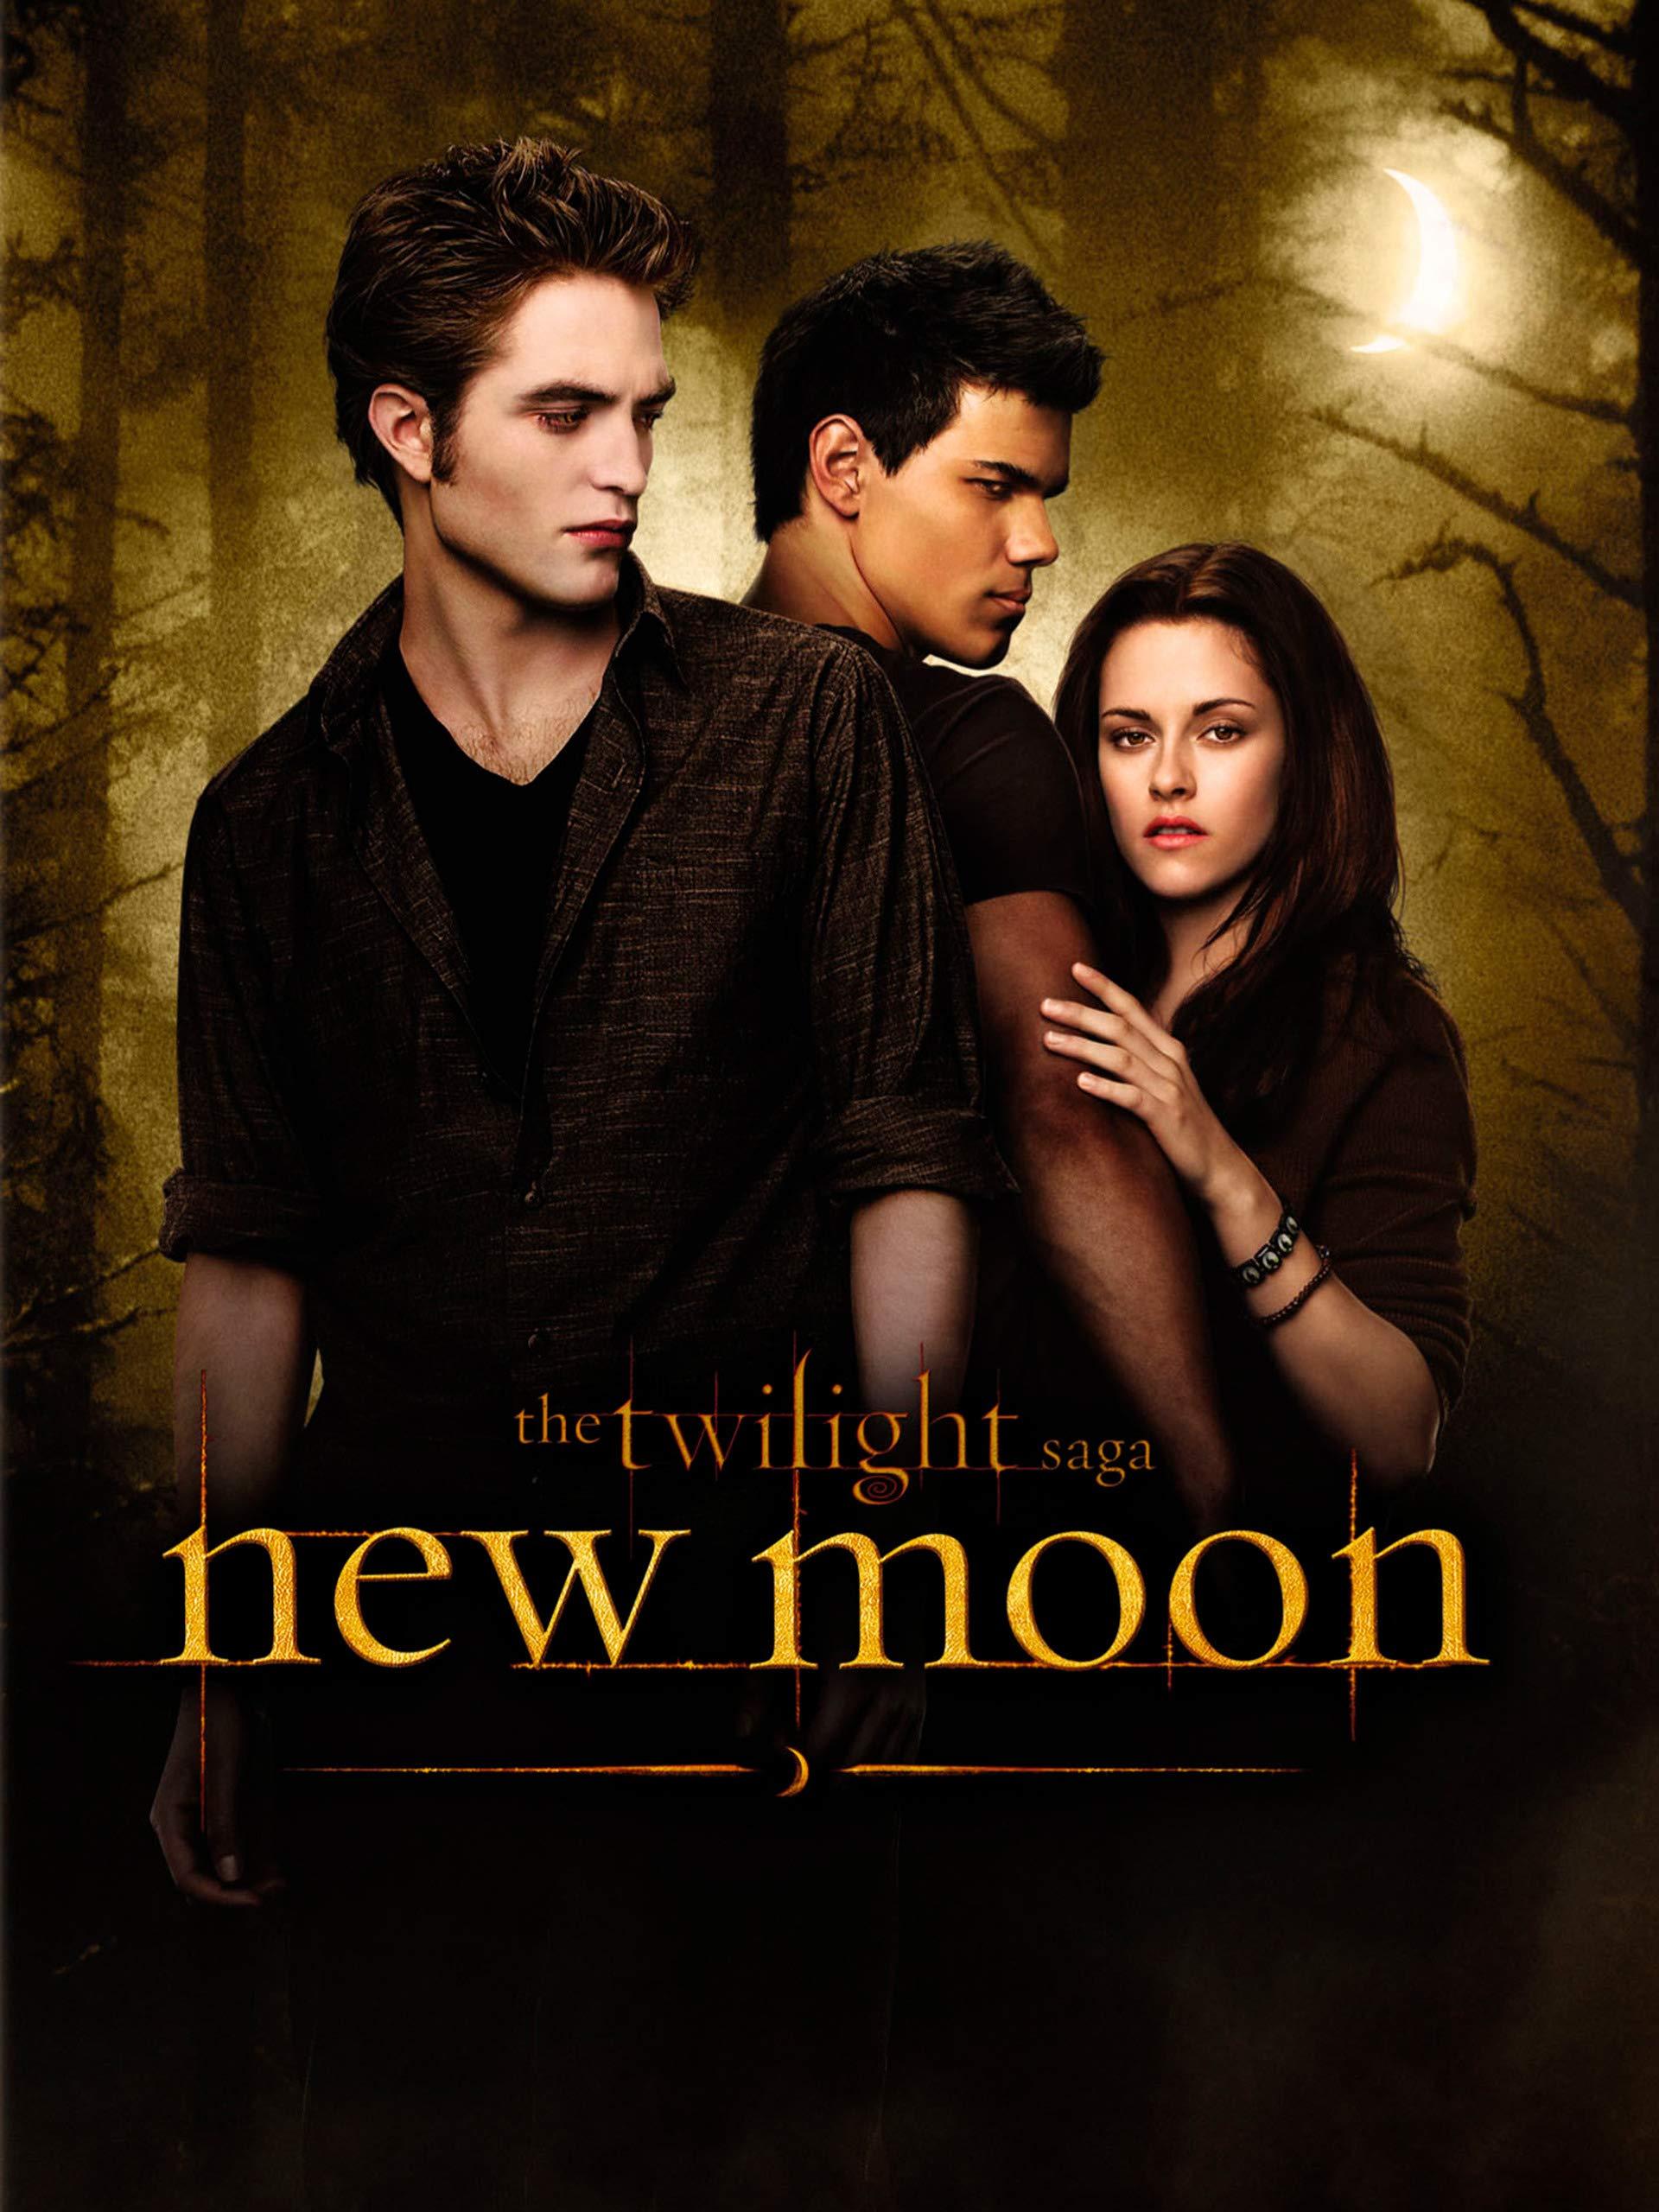 Watch The Twilight Saga New Moon Prime Video